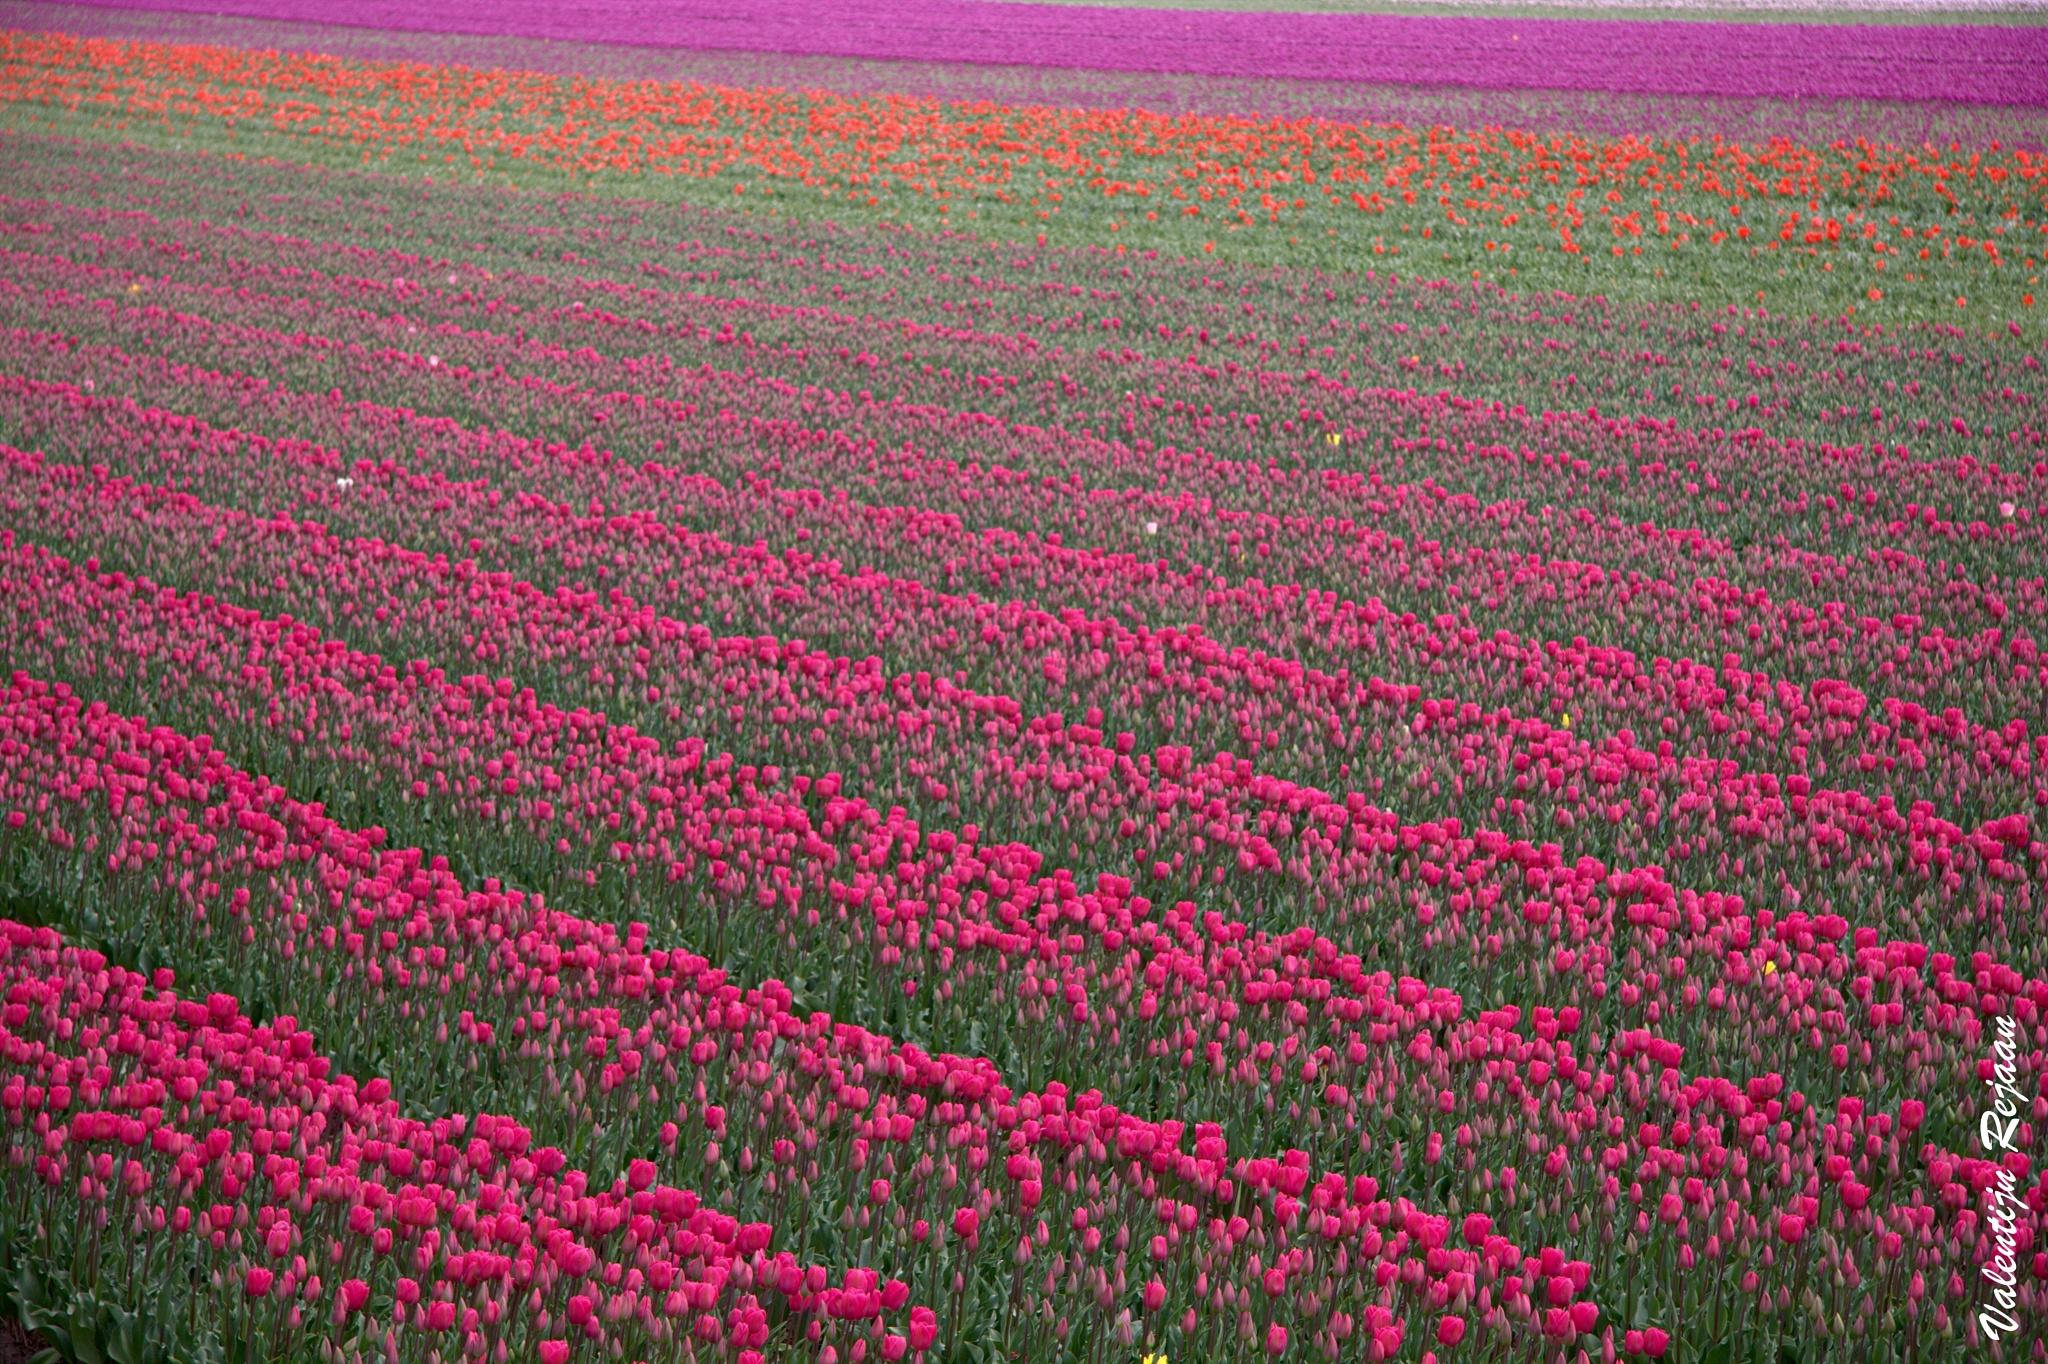 Tulips in Holland by Valentijn Rejaän